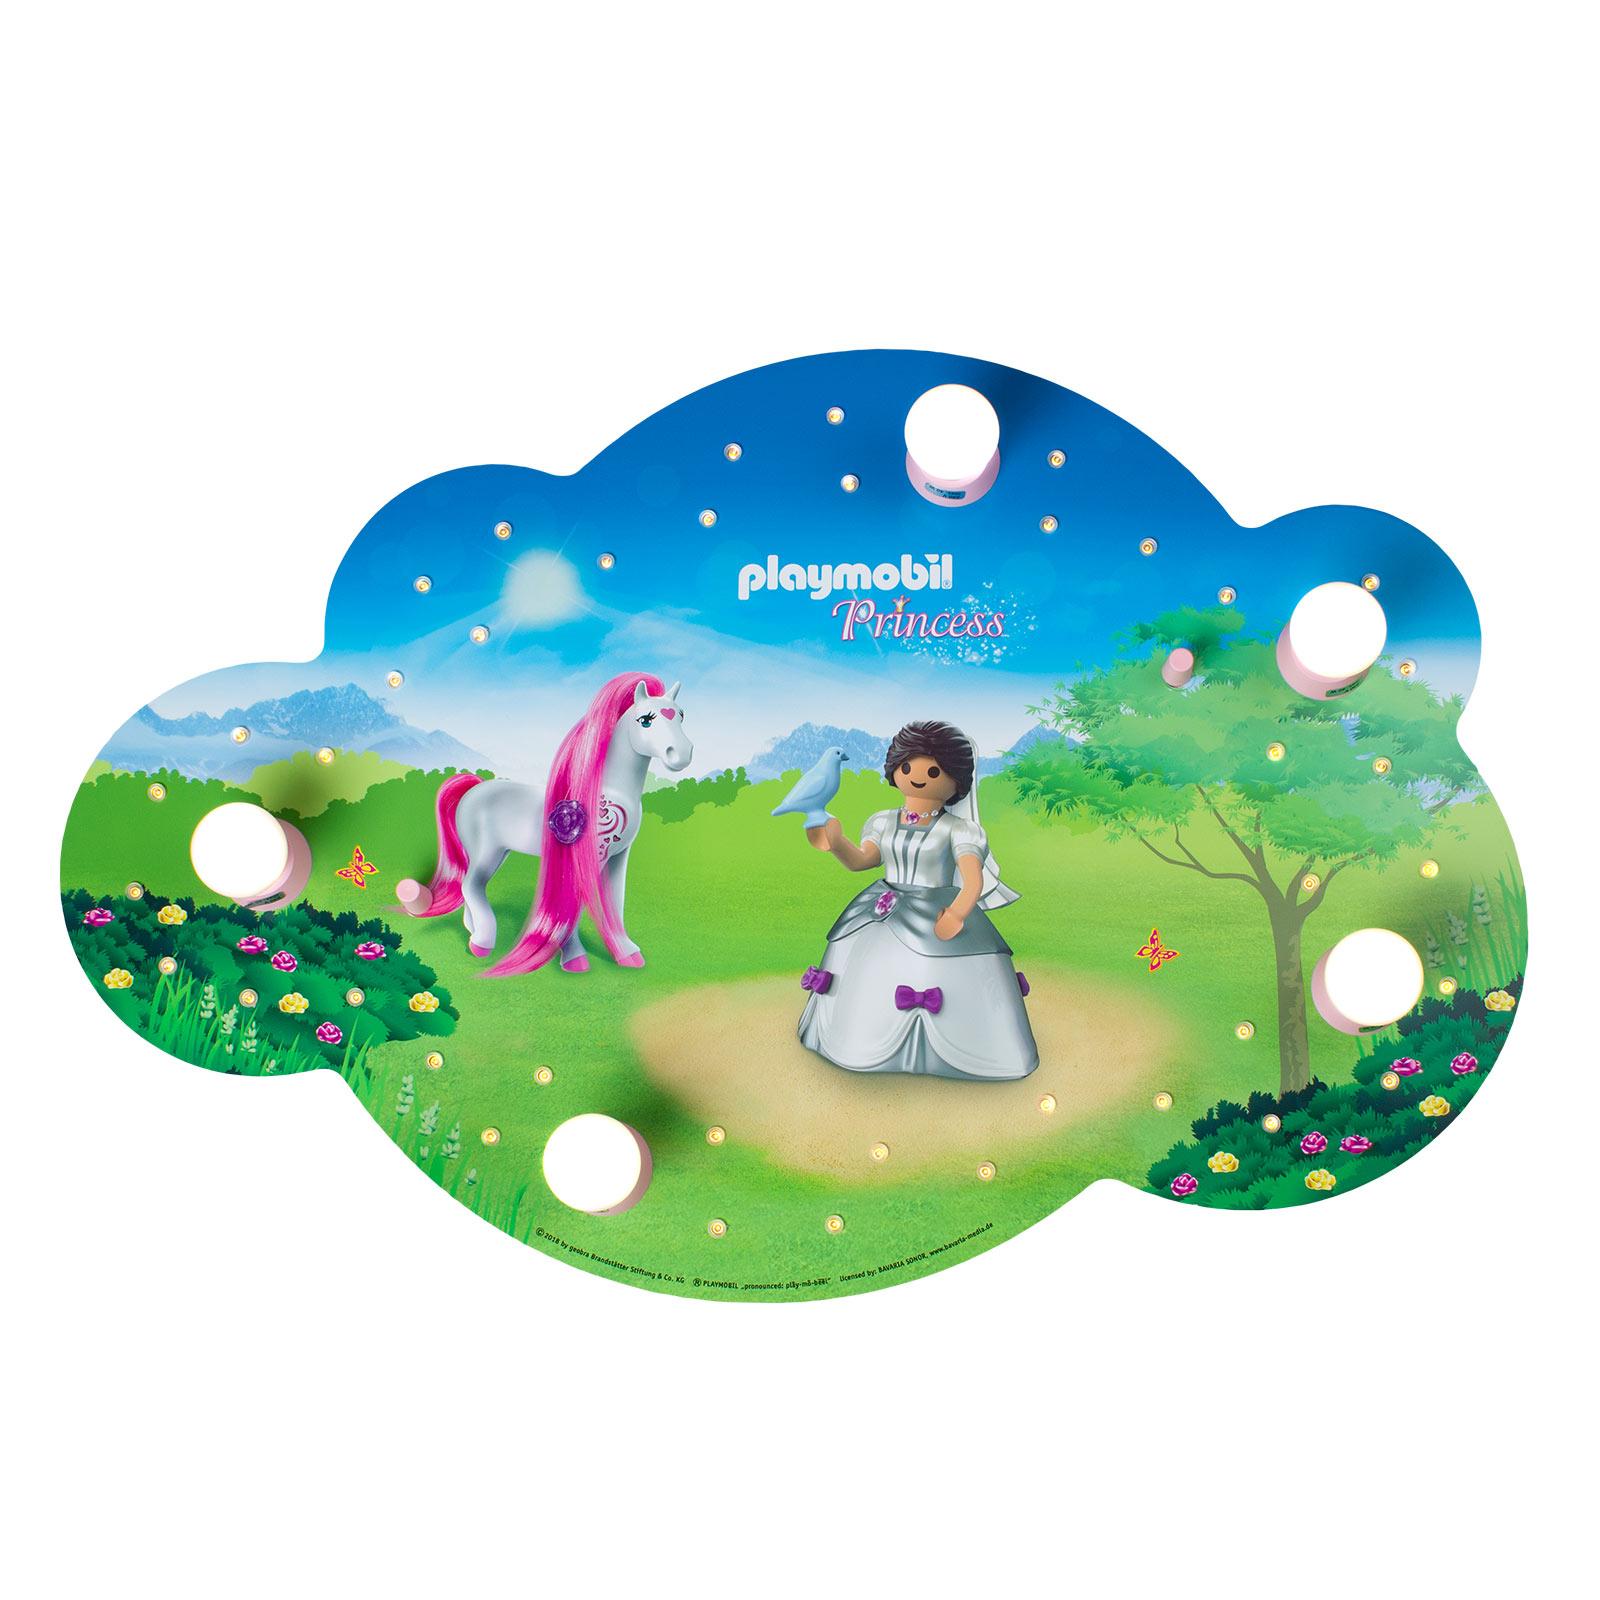 Deckenleuchte Bildwolke PLAYMOBIL Princess